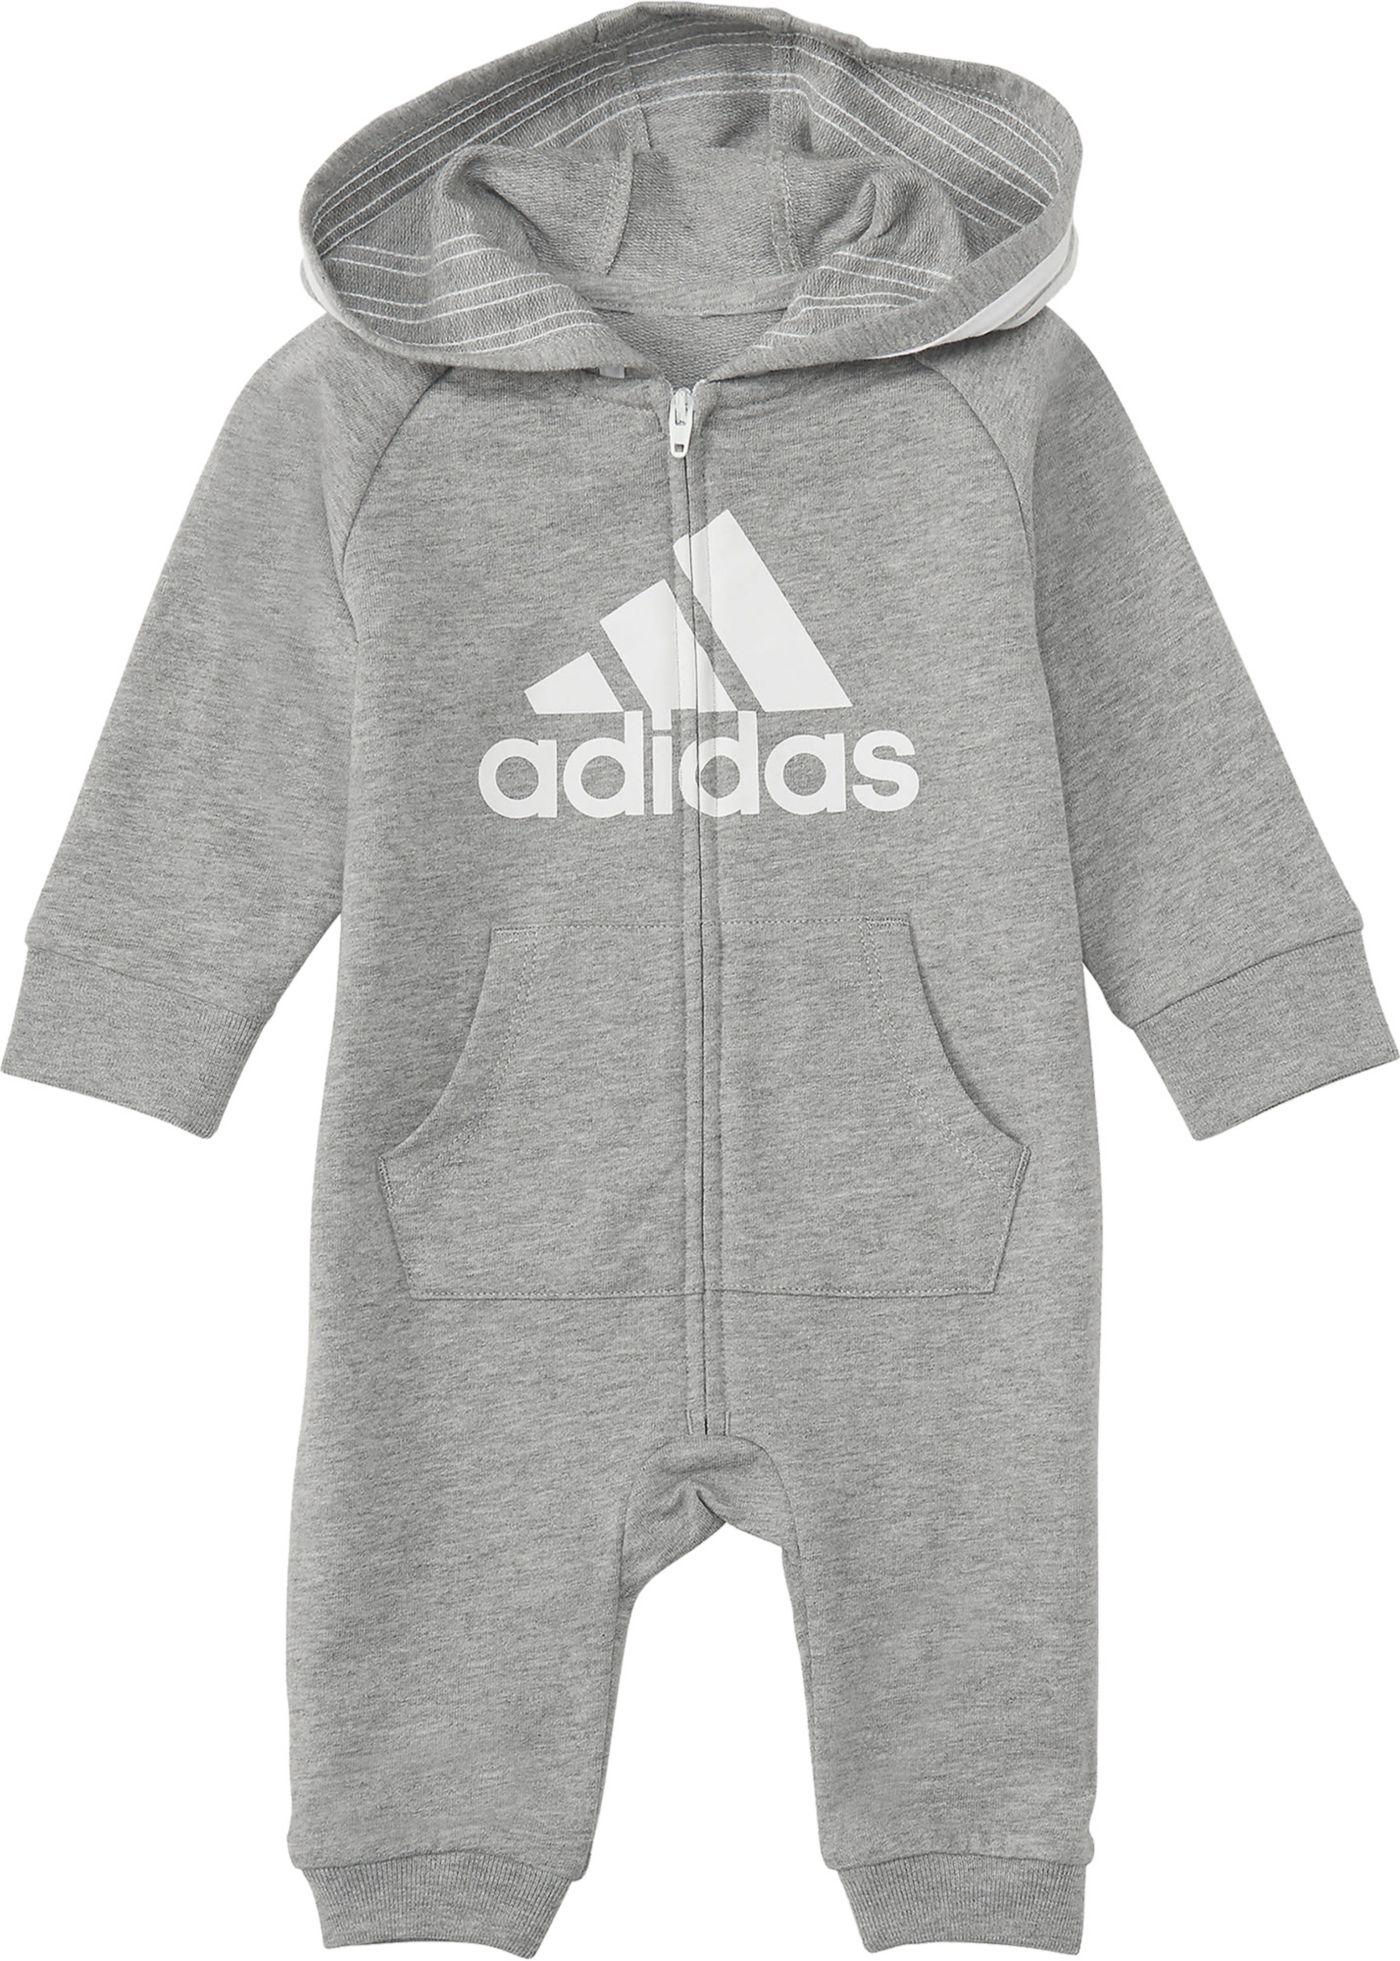 adidas Infant Boys' Long Sleeve Onesie